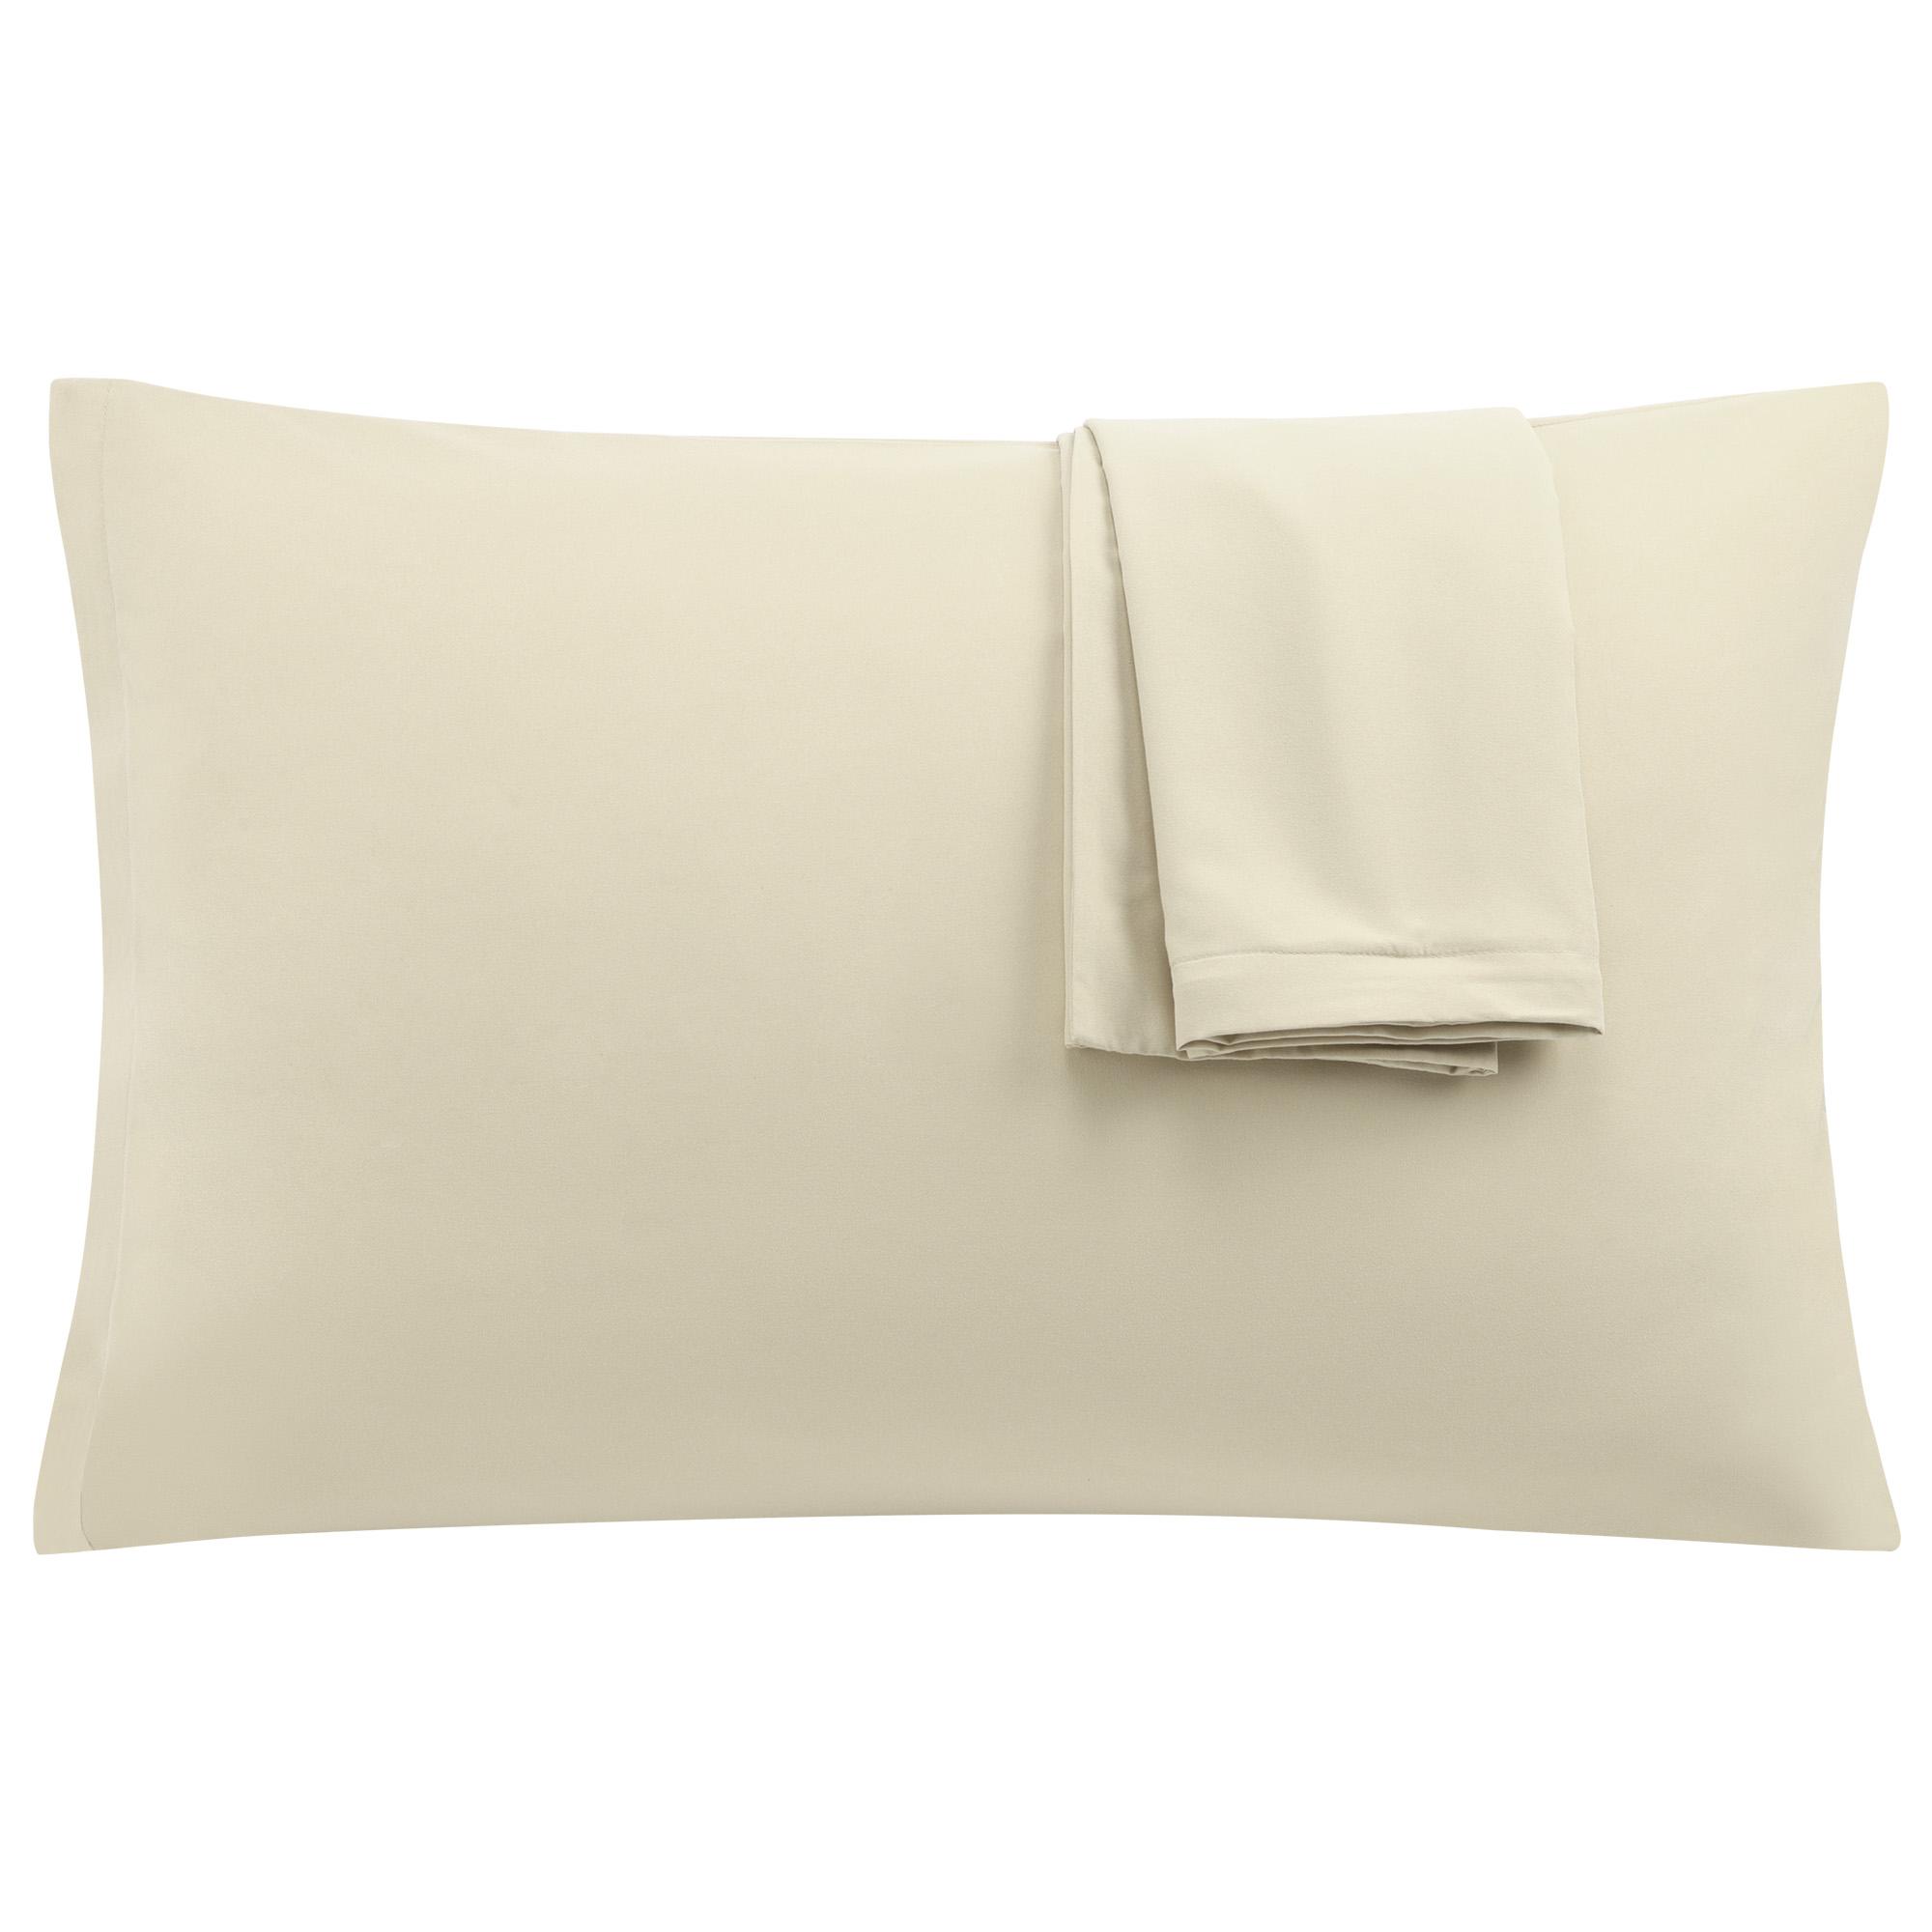 Khaki Pillowcases Soft Microfiber Pillow Case Cover with Zipper Standard, 2 Pack